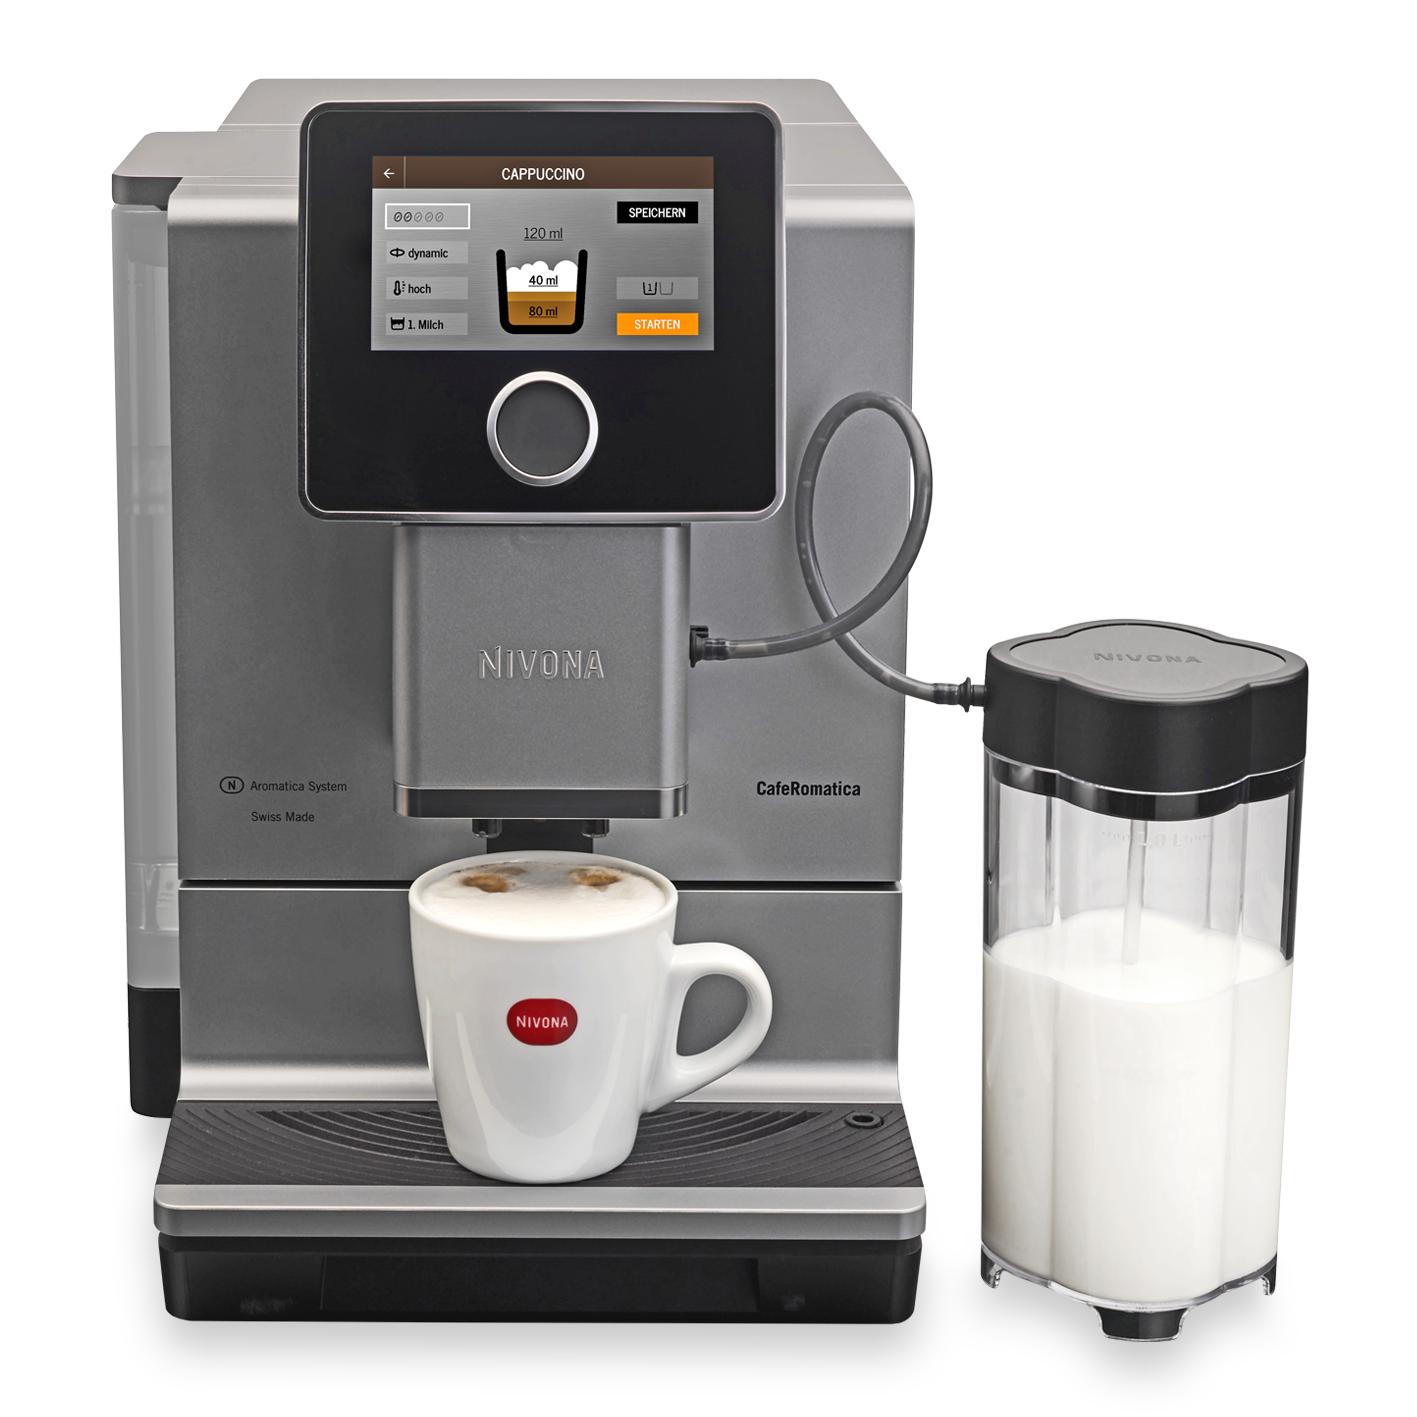 Vorschau: NIVONA CafeRomatica Serie 9 Kaffeevollautomat bei MIOMONDO